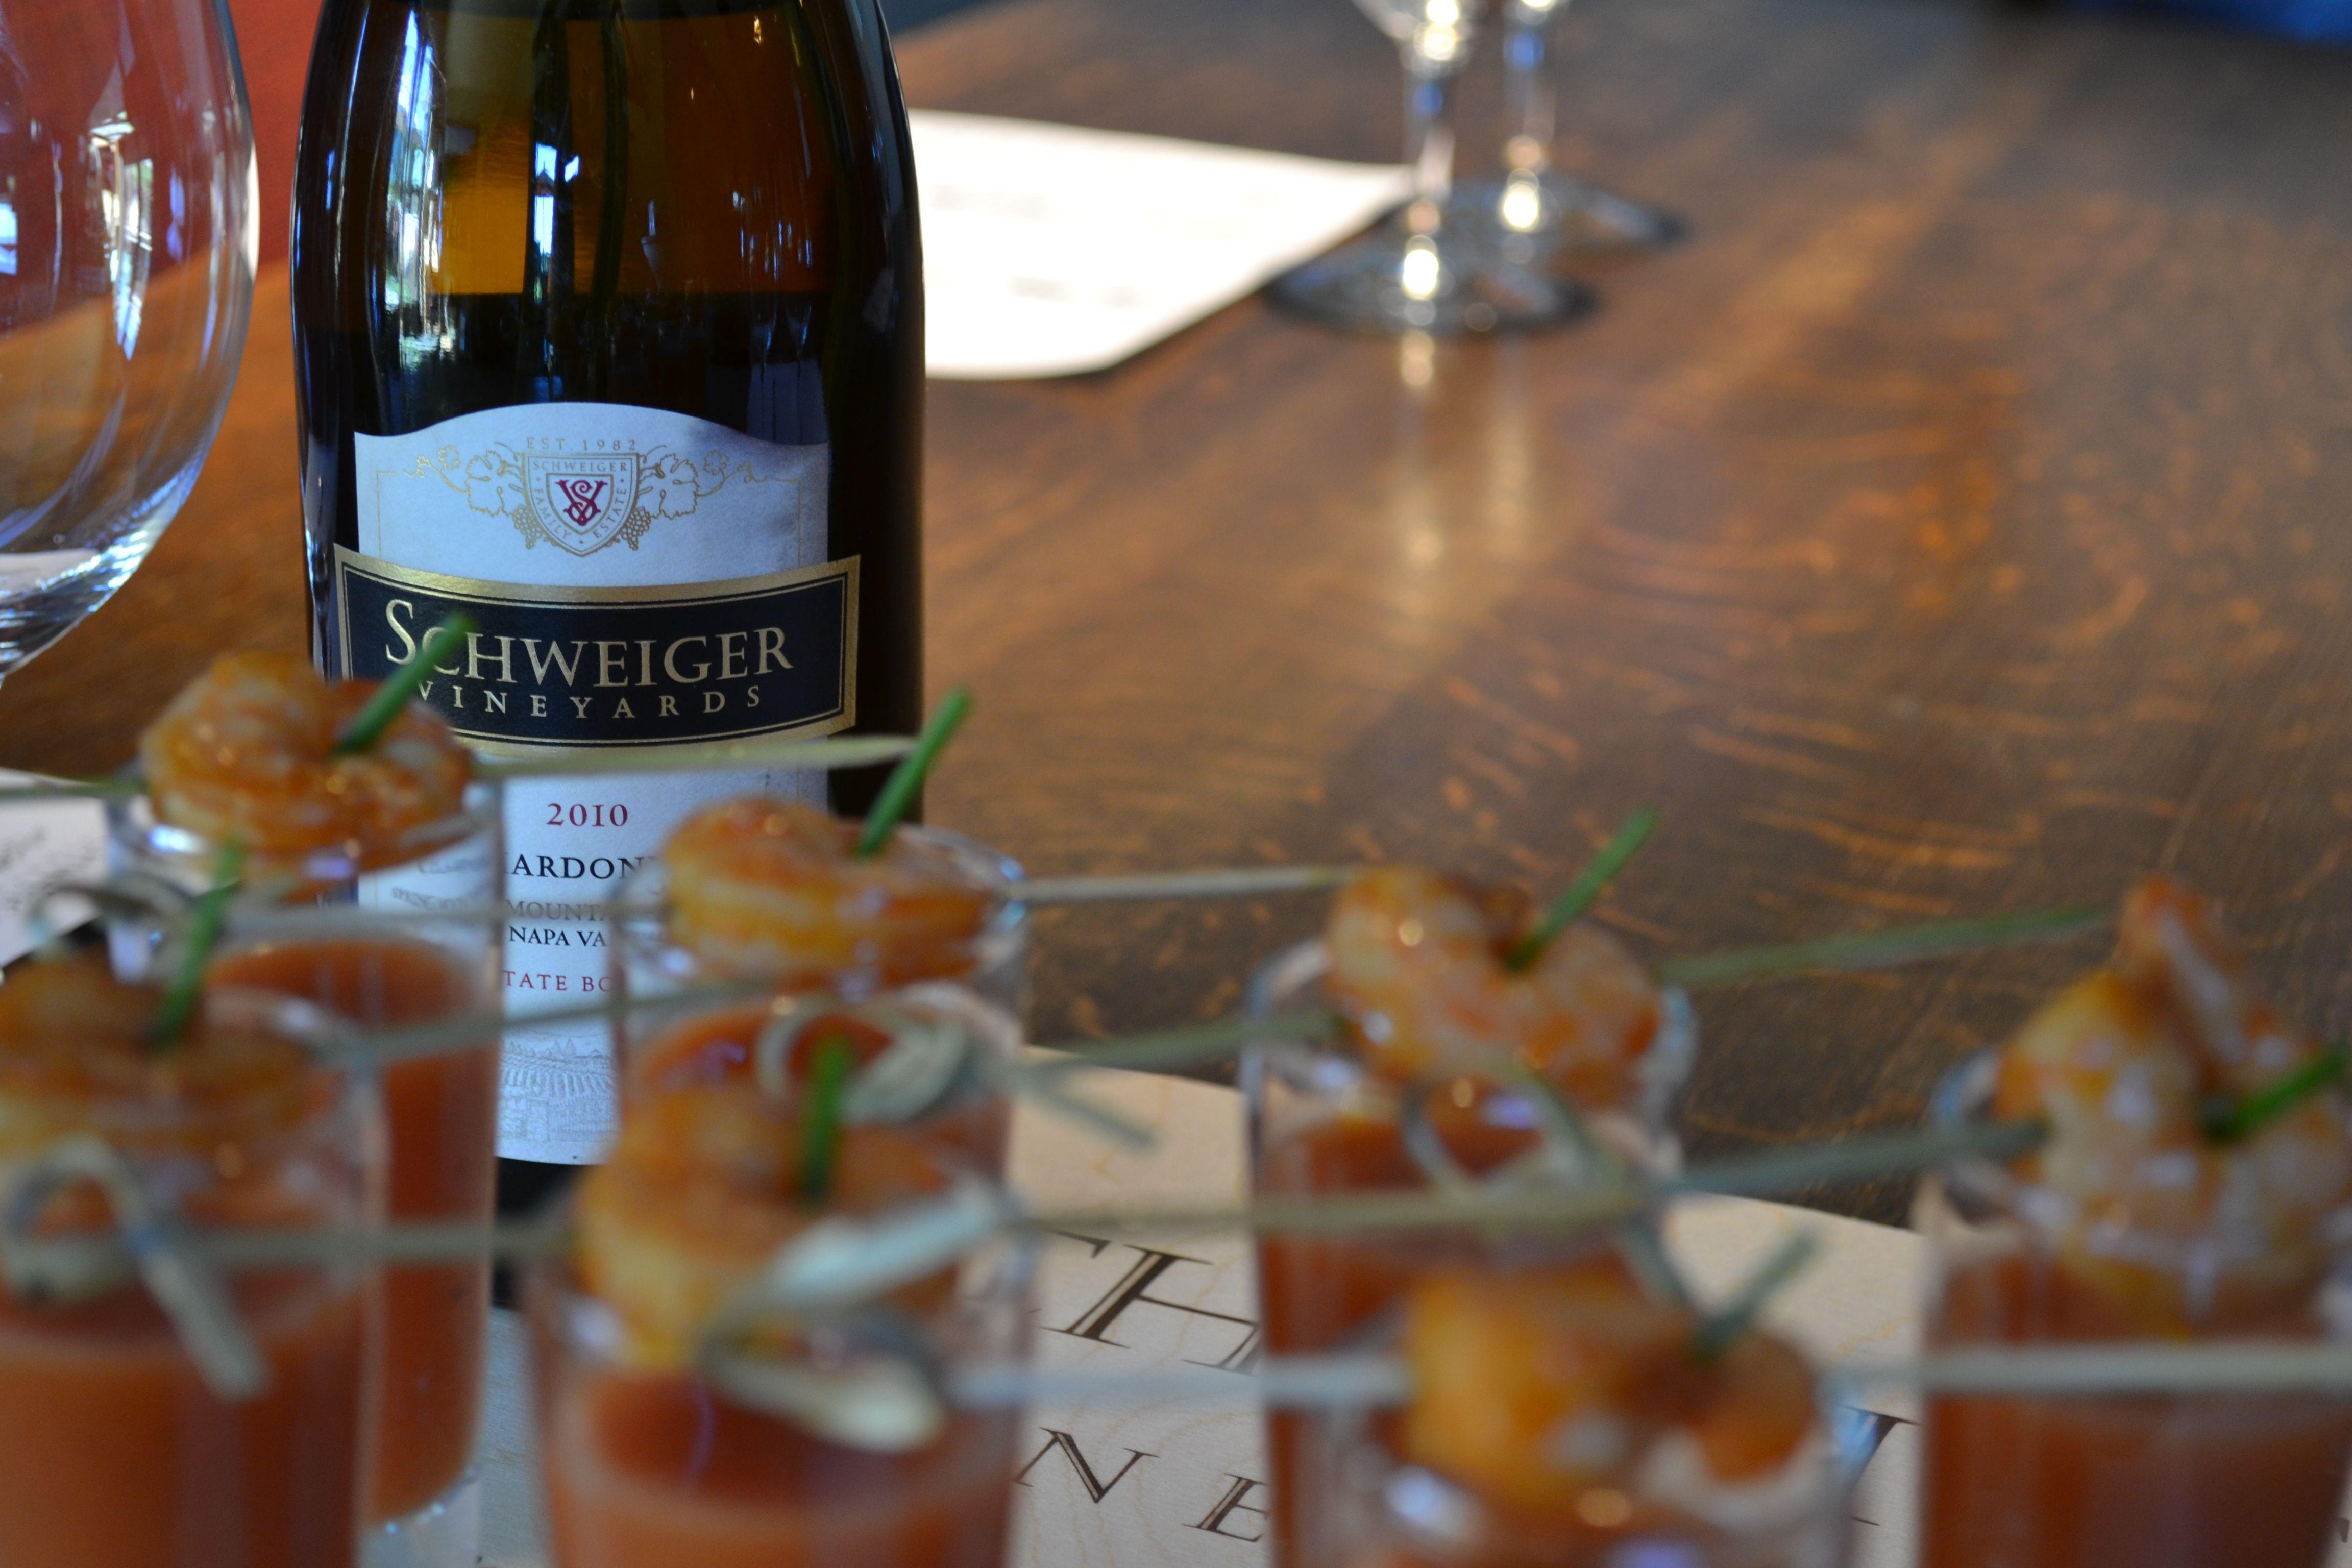 Pineapple Heirloom Tomato Gazpacho, Spiced Shrimp, Tarragon, Lemon Oil #schweigervineyards #chardonnay